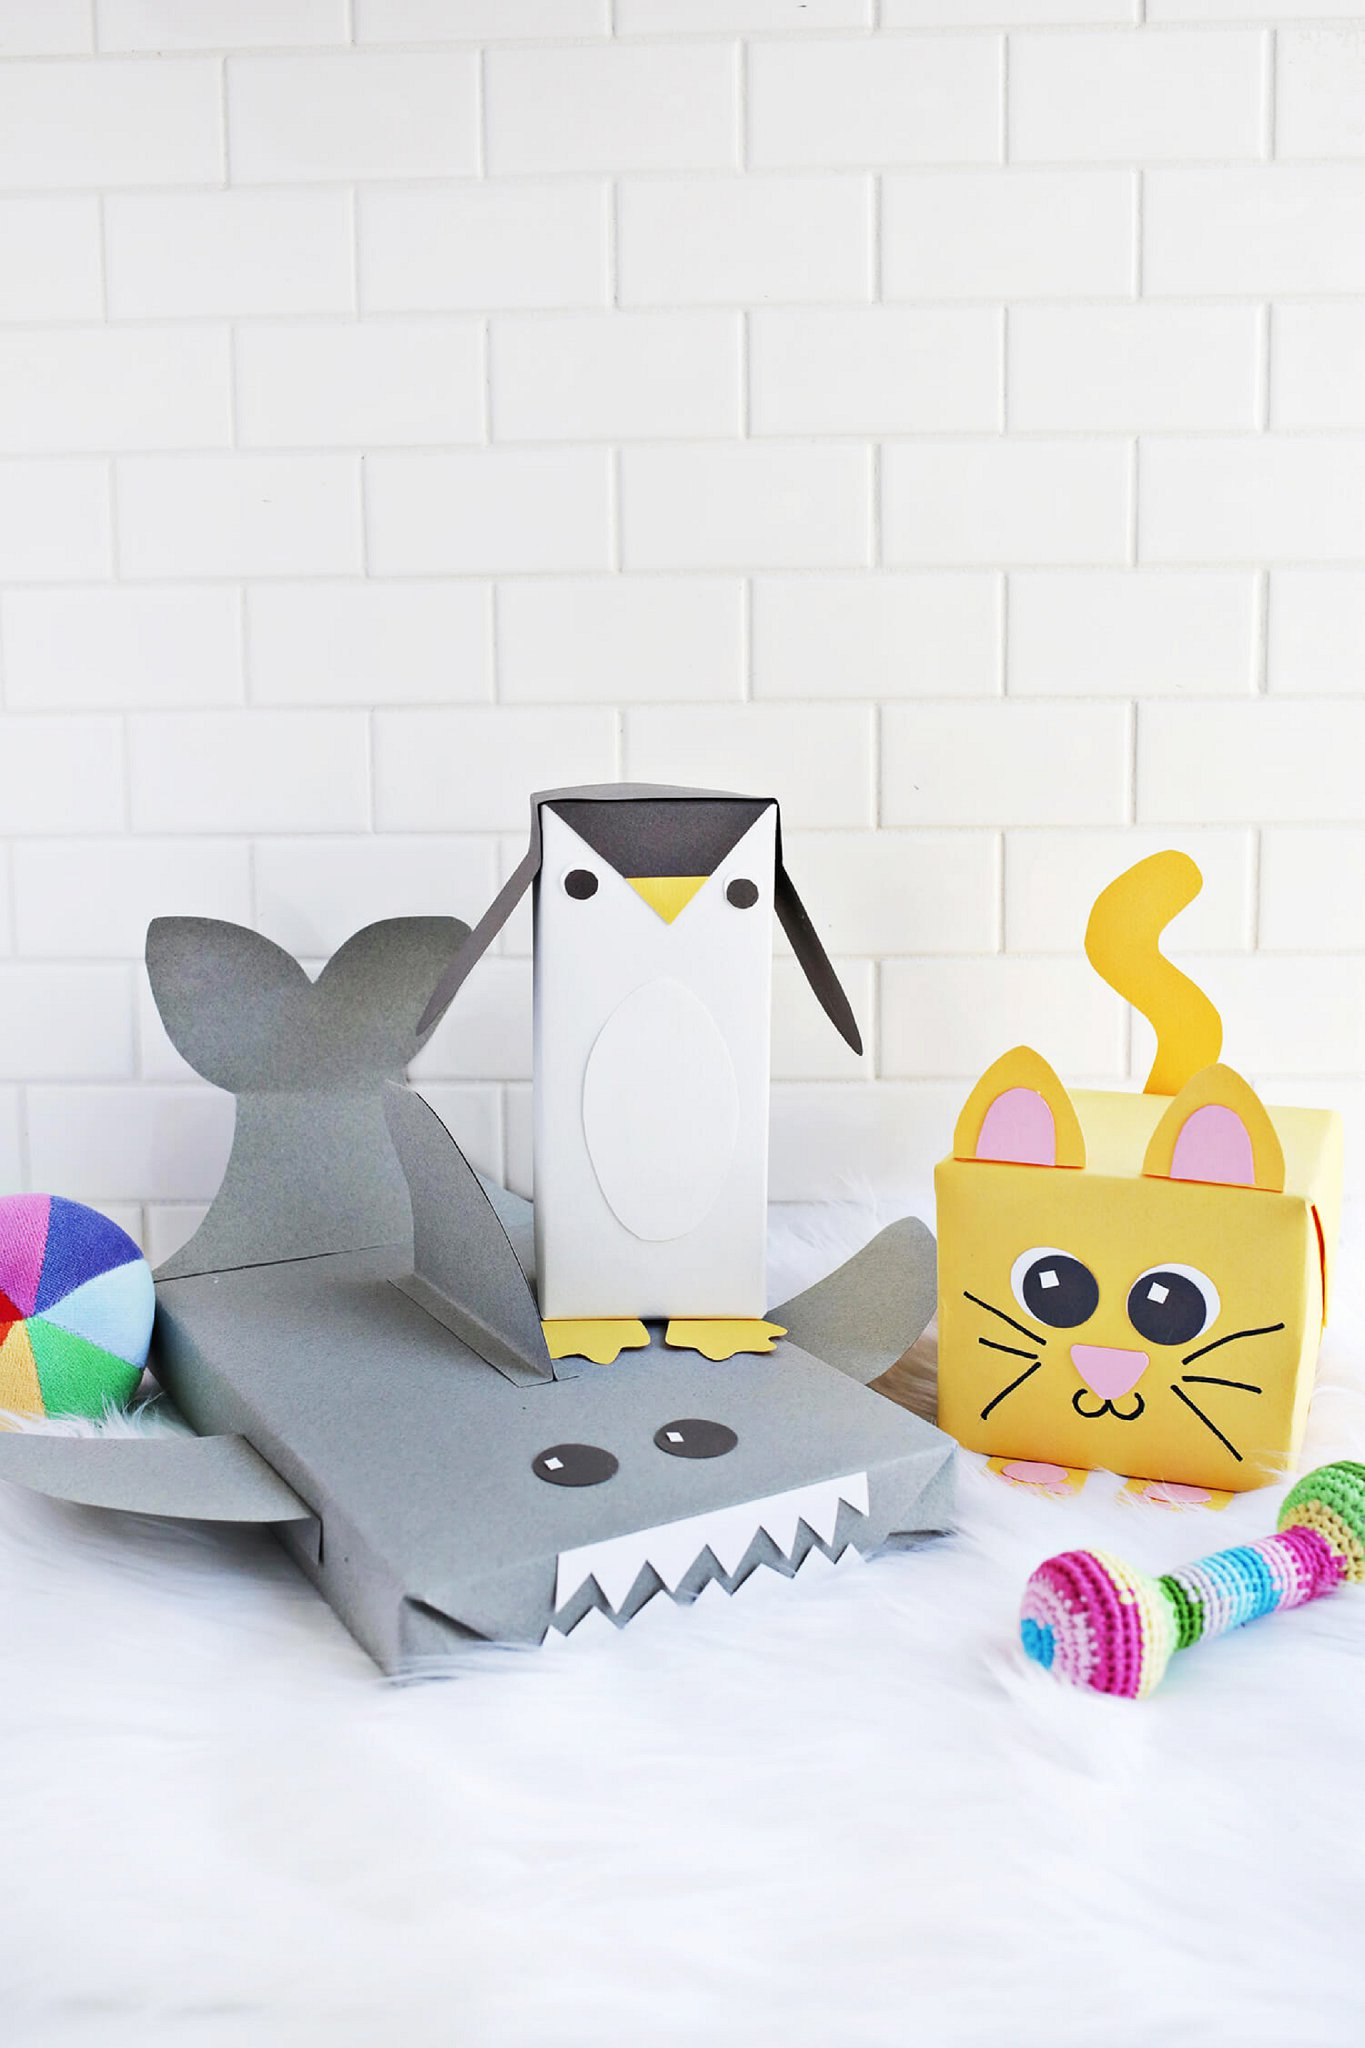 Inpakken dieren